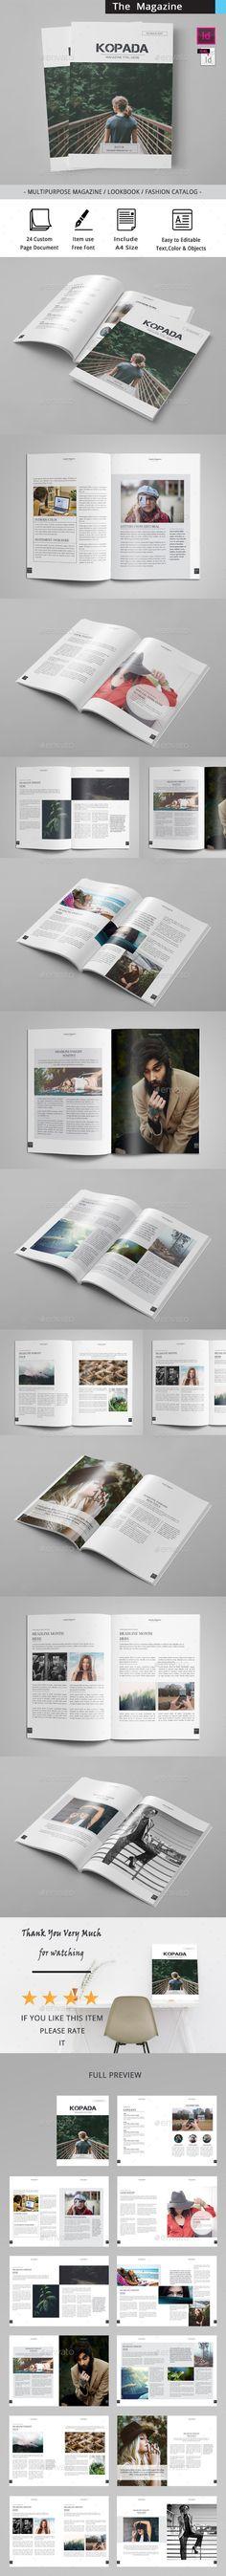 The Magazine - Magazines Print Templates Download here : https://graphicriver.net/item/the-magazine/19523501?s_rank=60&ref=Al-fatih